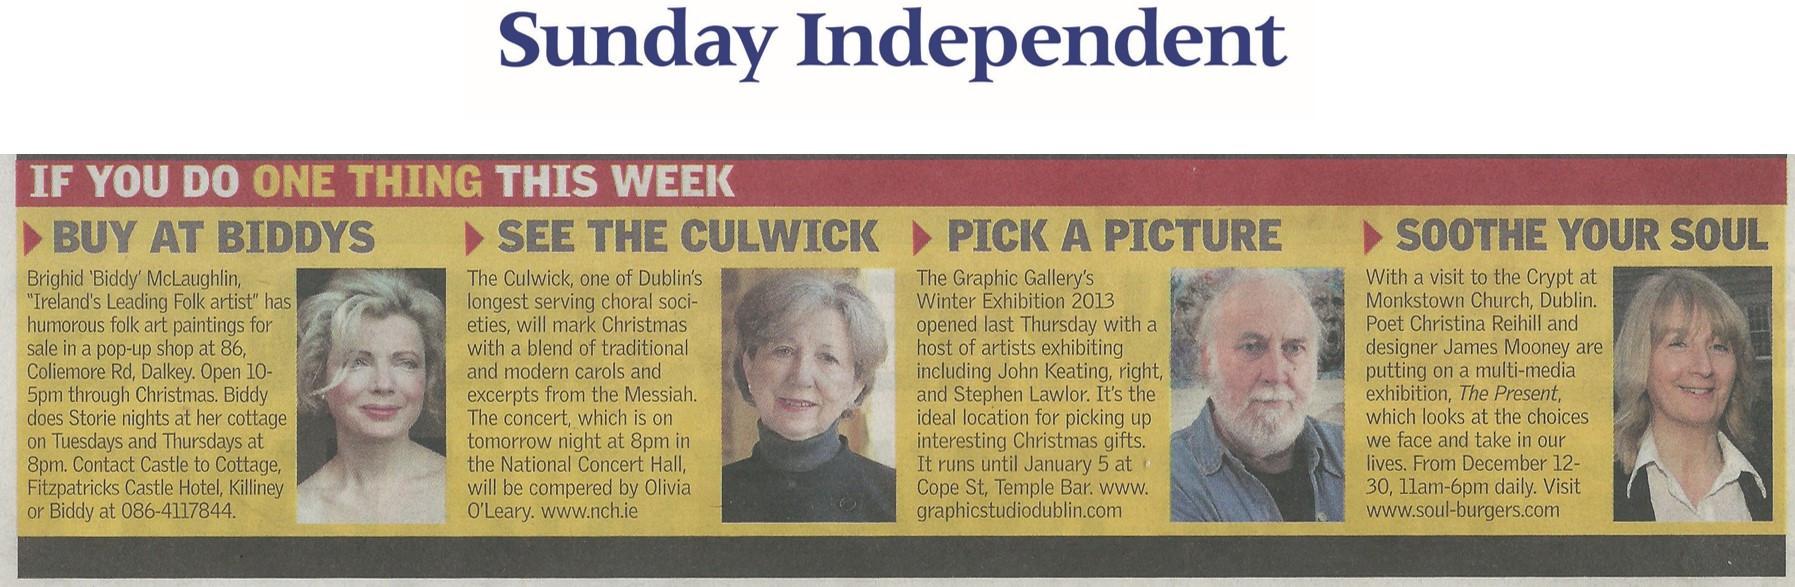 Sunday Independent, Madeleine Keane, The